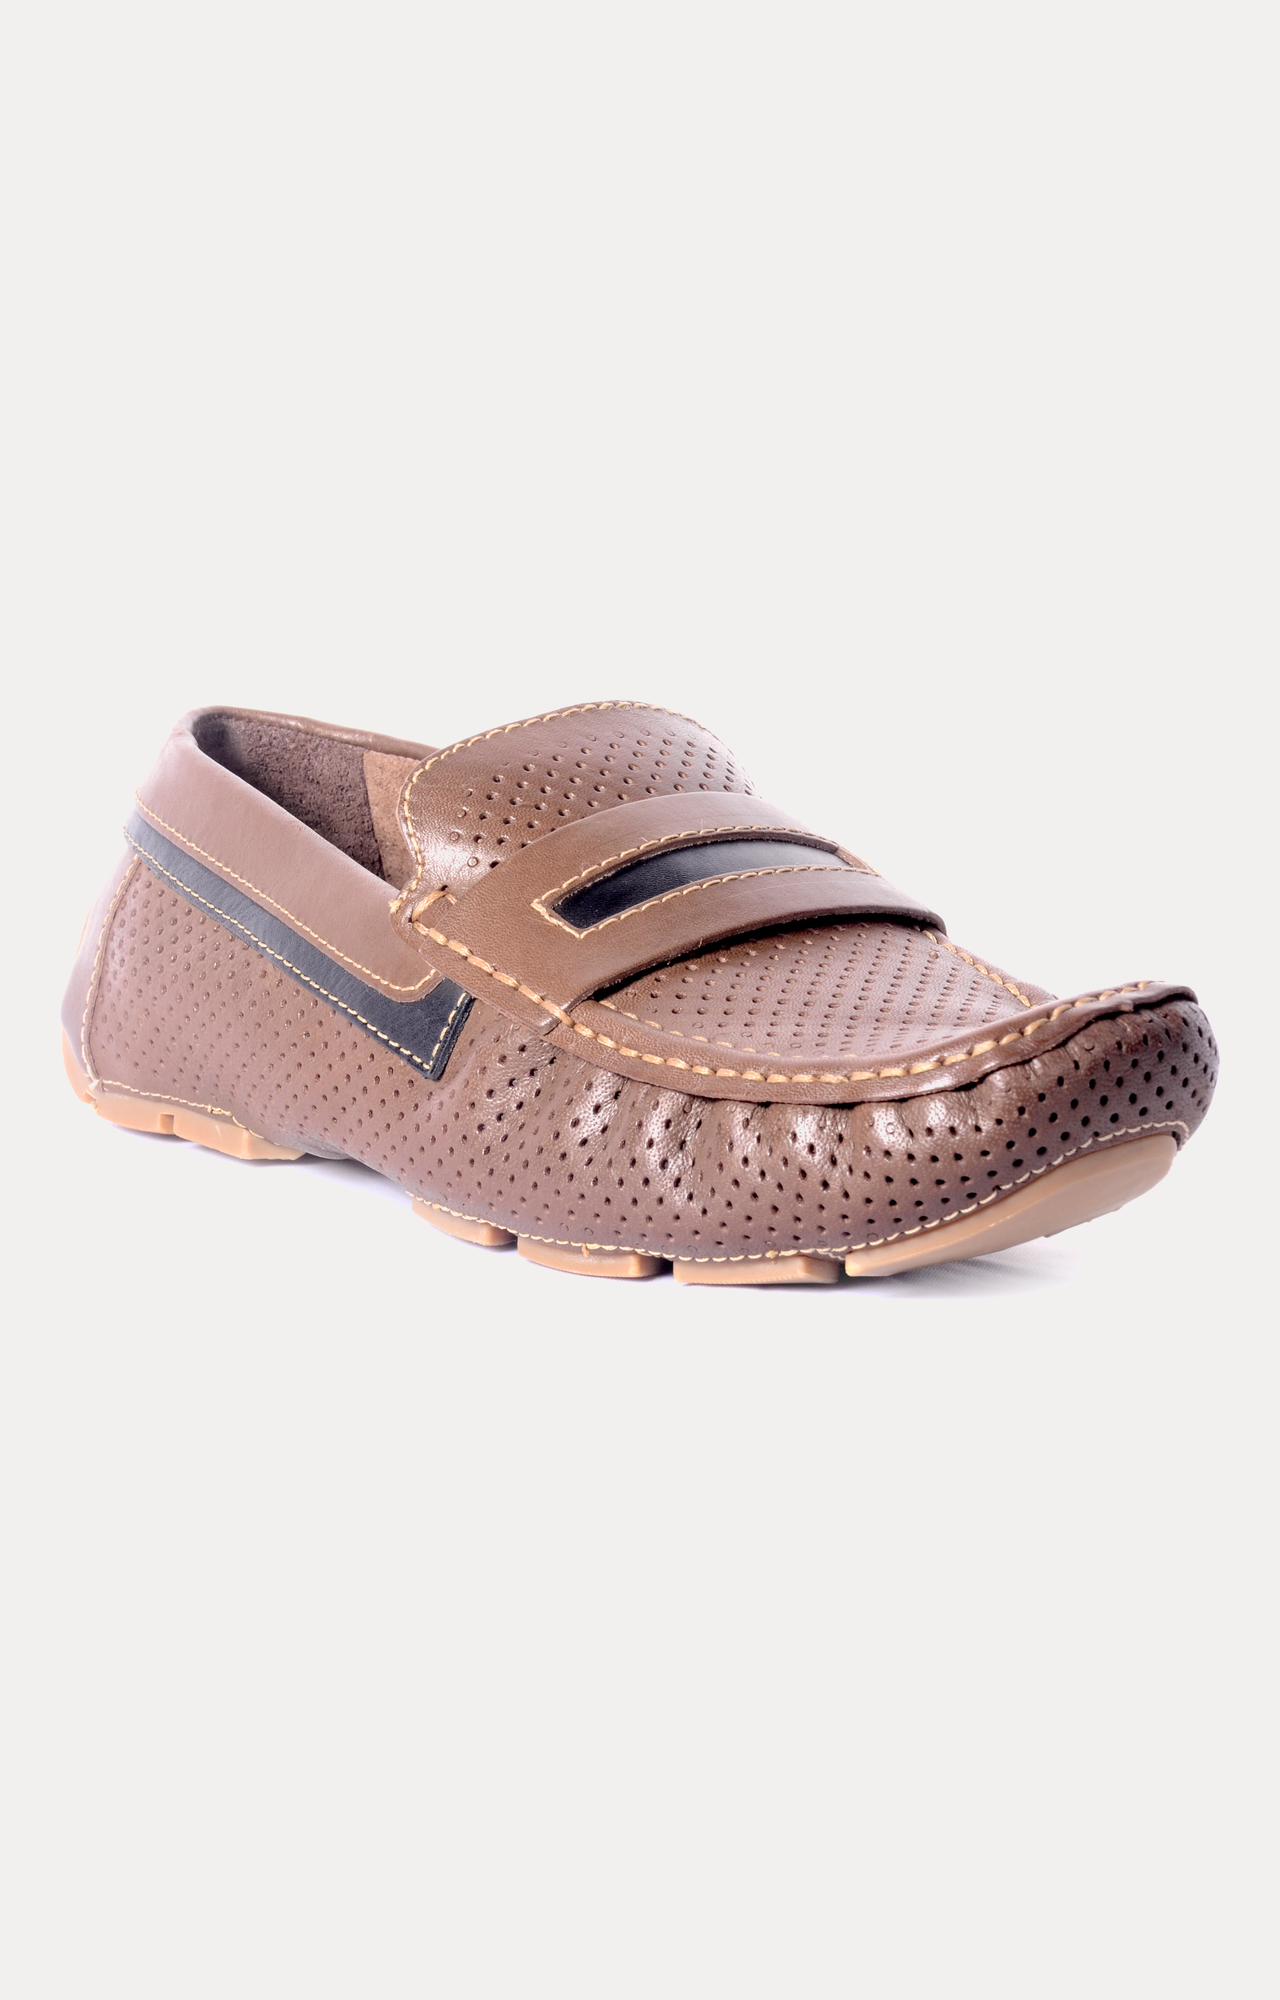 STEVE MADDEN | Brown Loafers